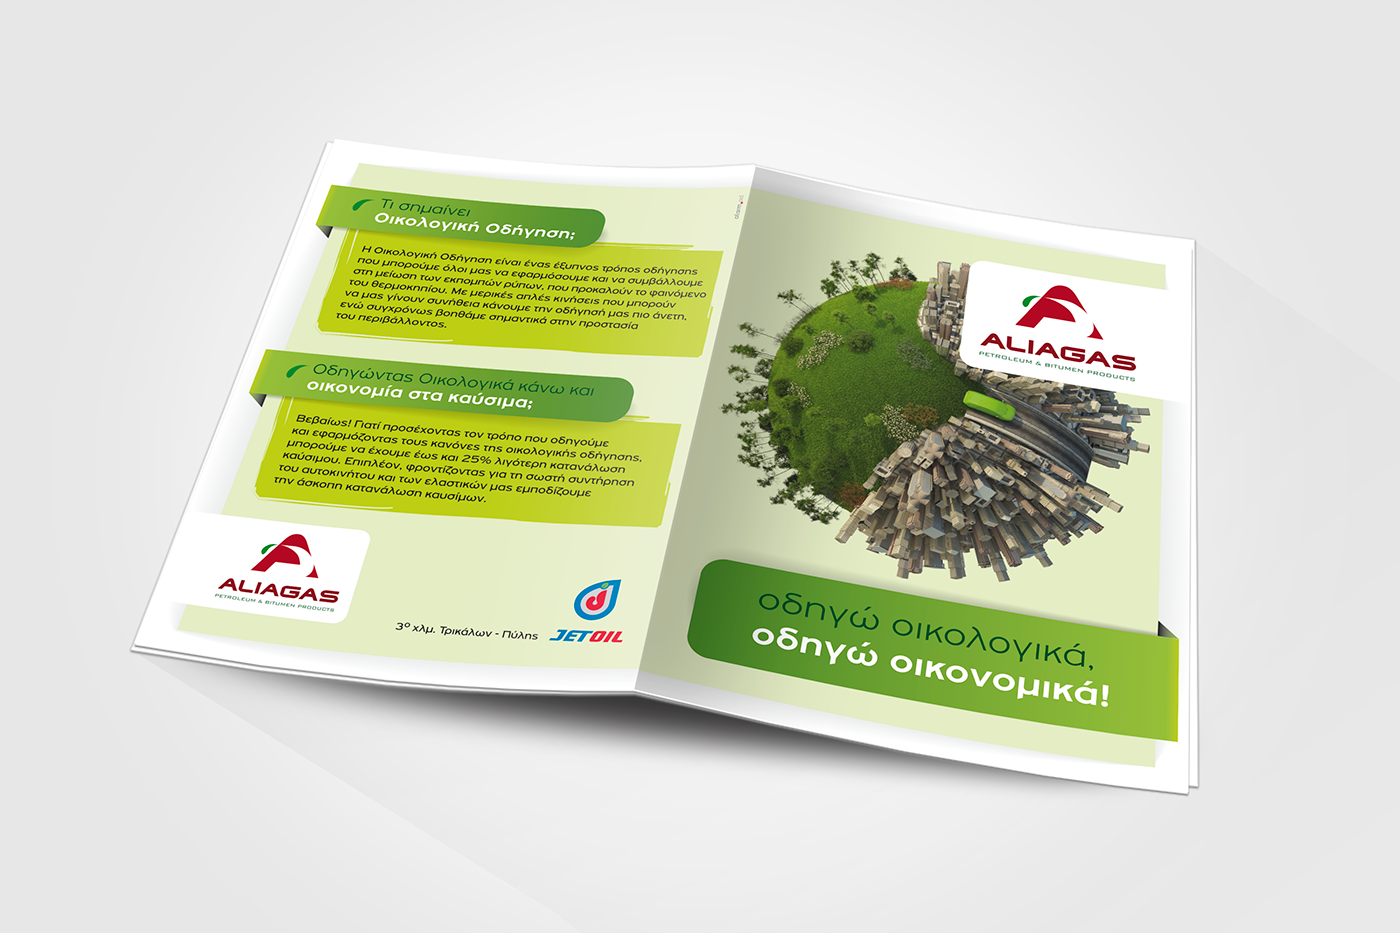 Aliagas Eco drive brochure